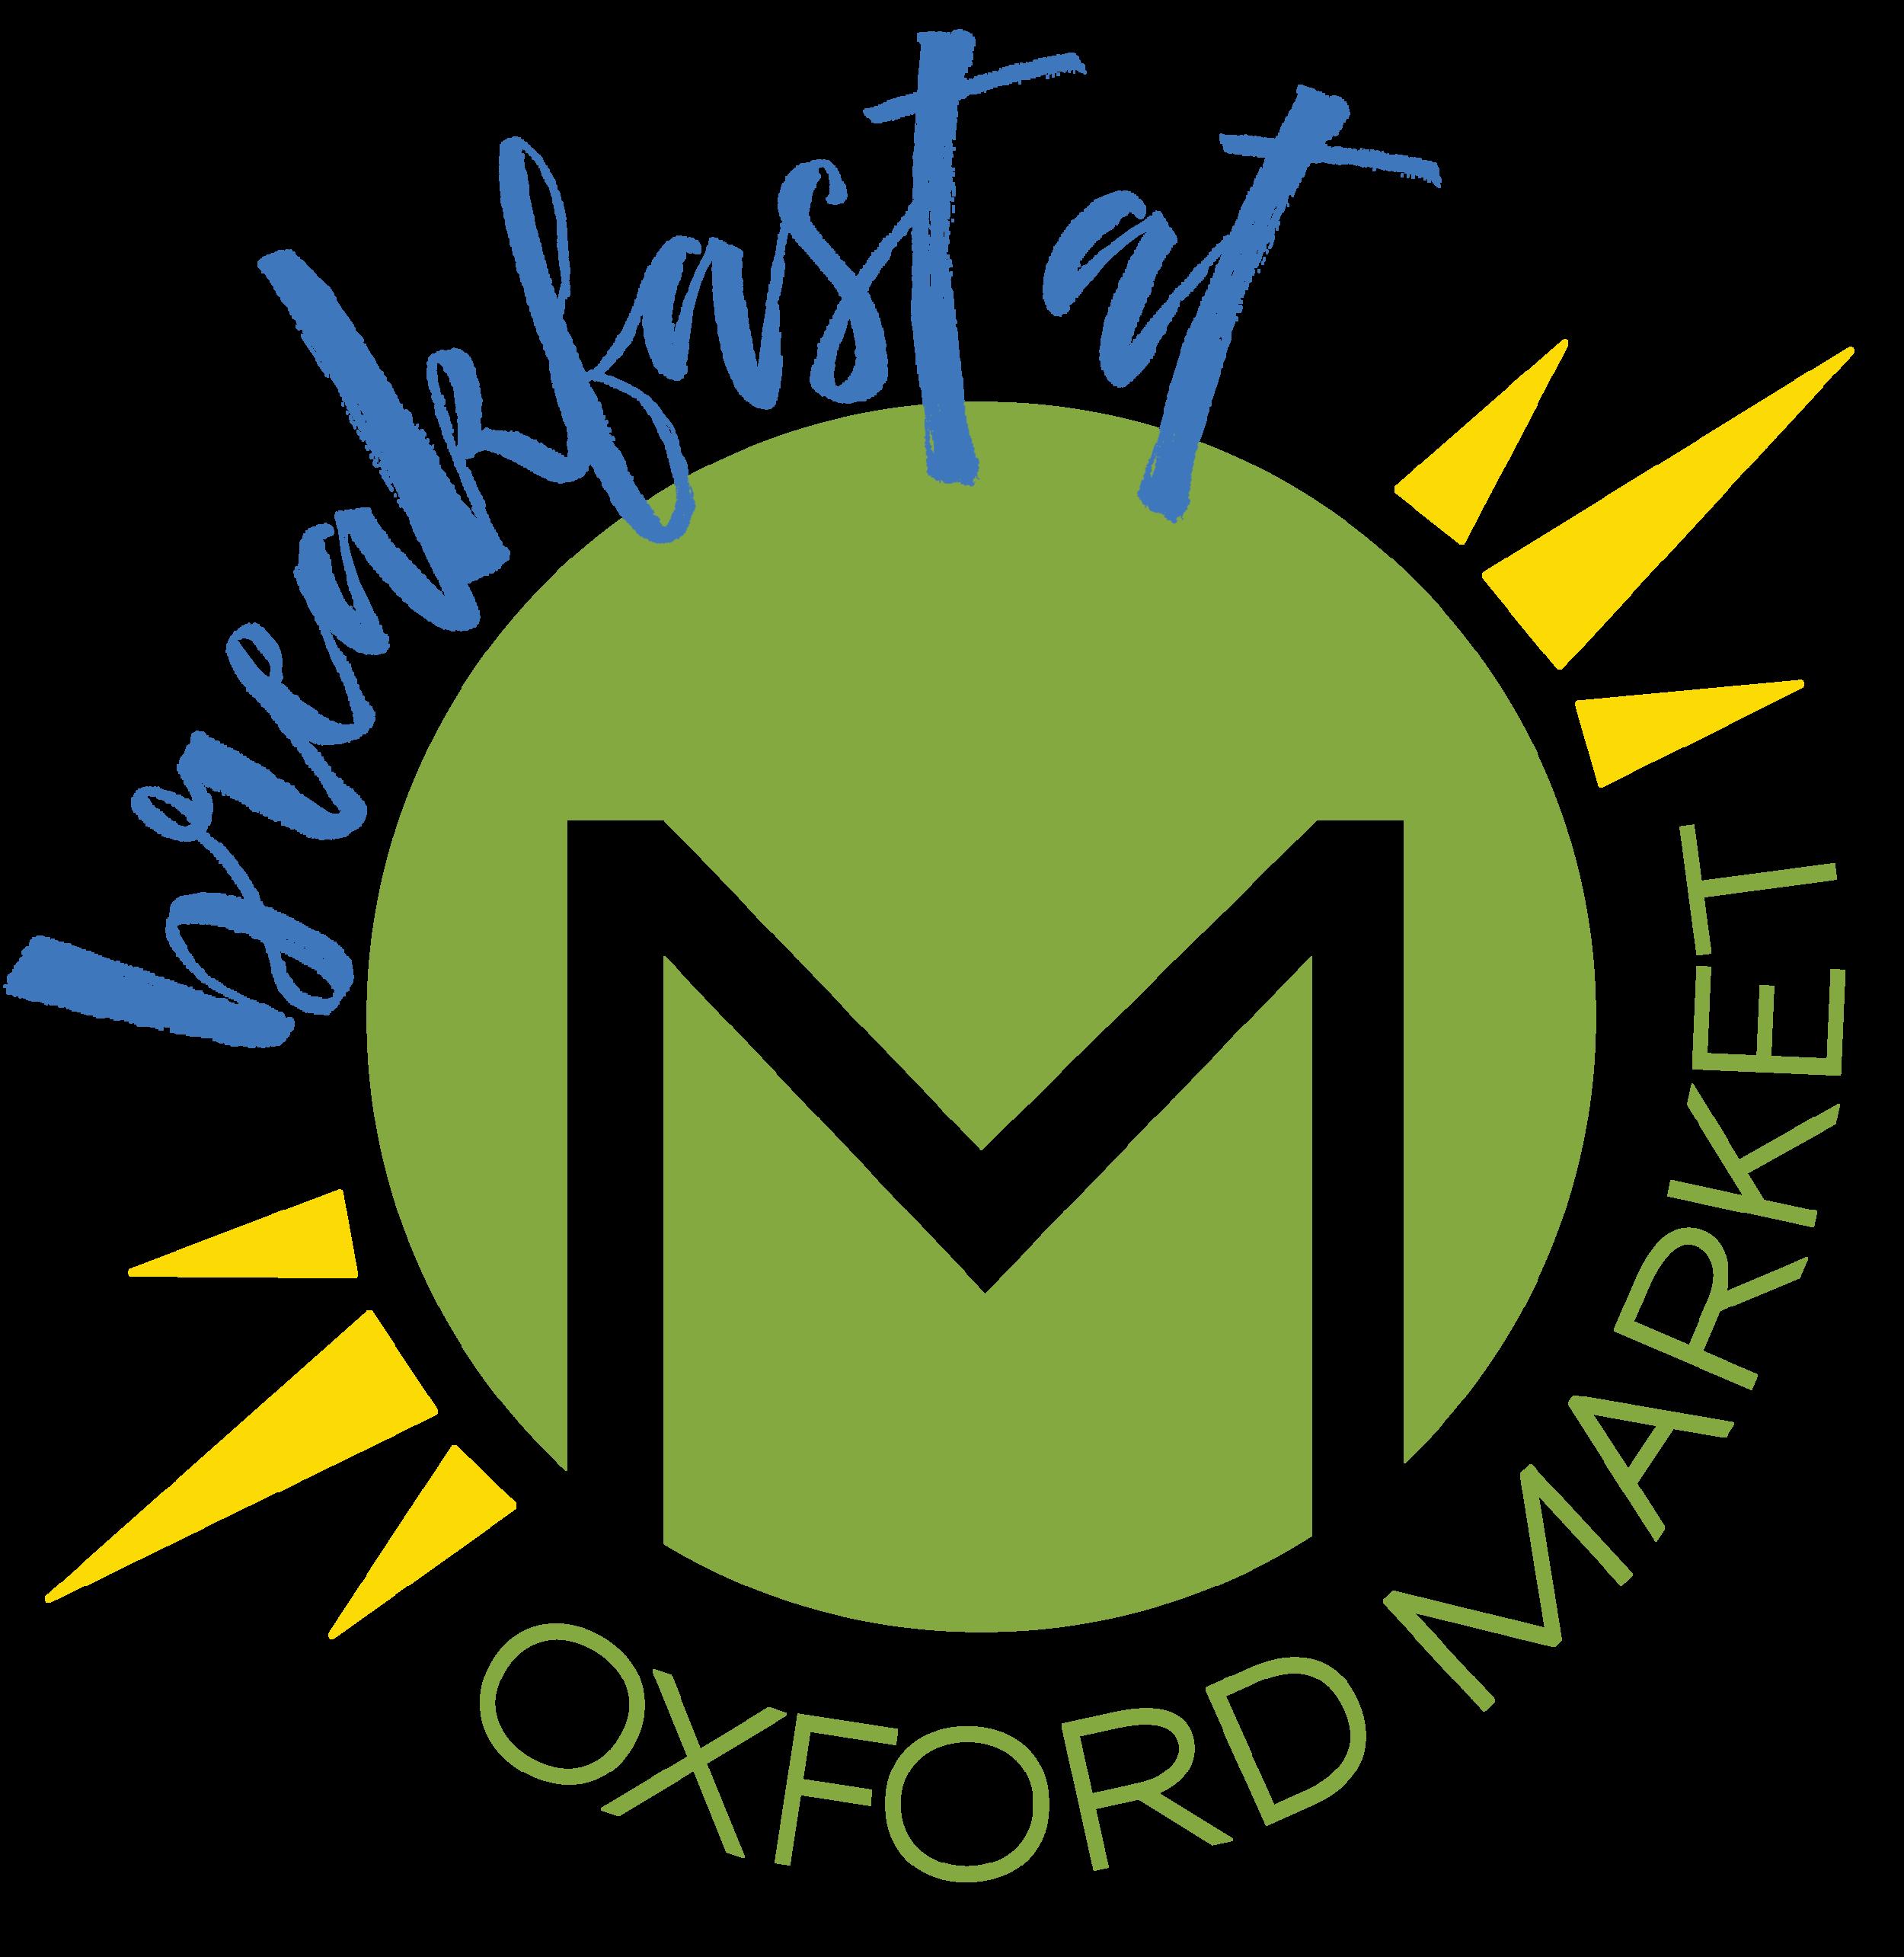 BREAKFASTAT OXFORD MARKET LOGO.png